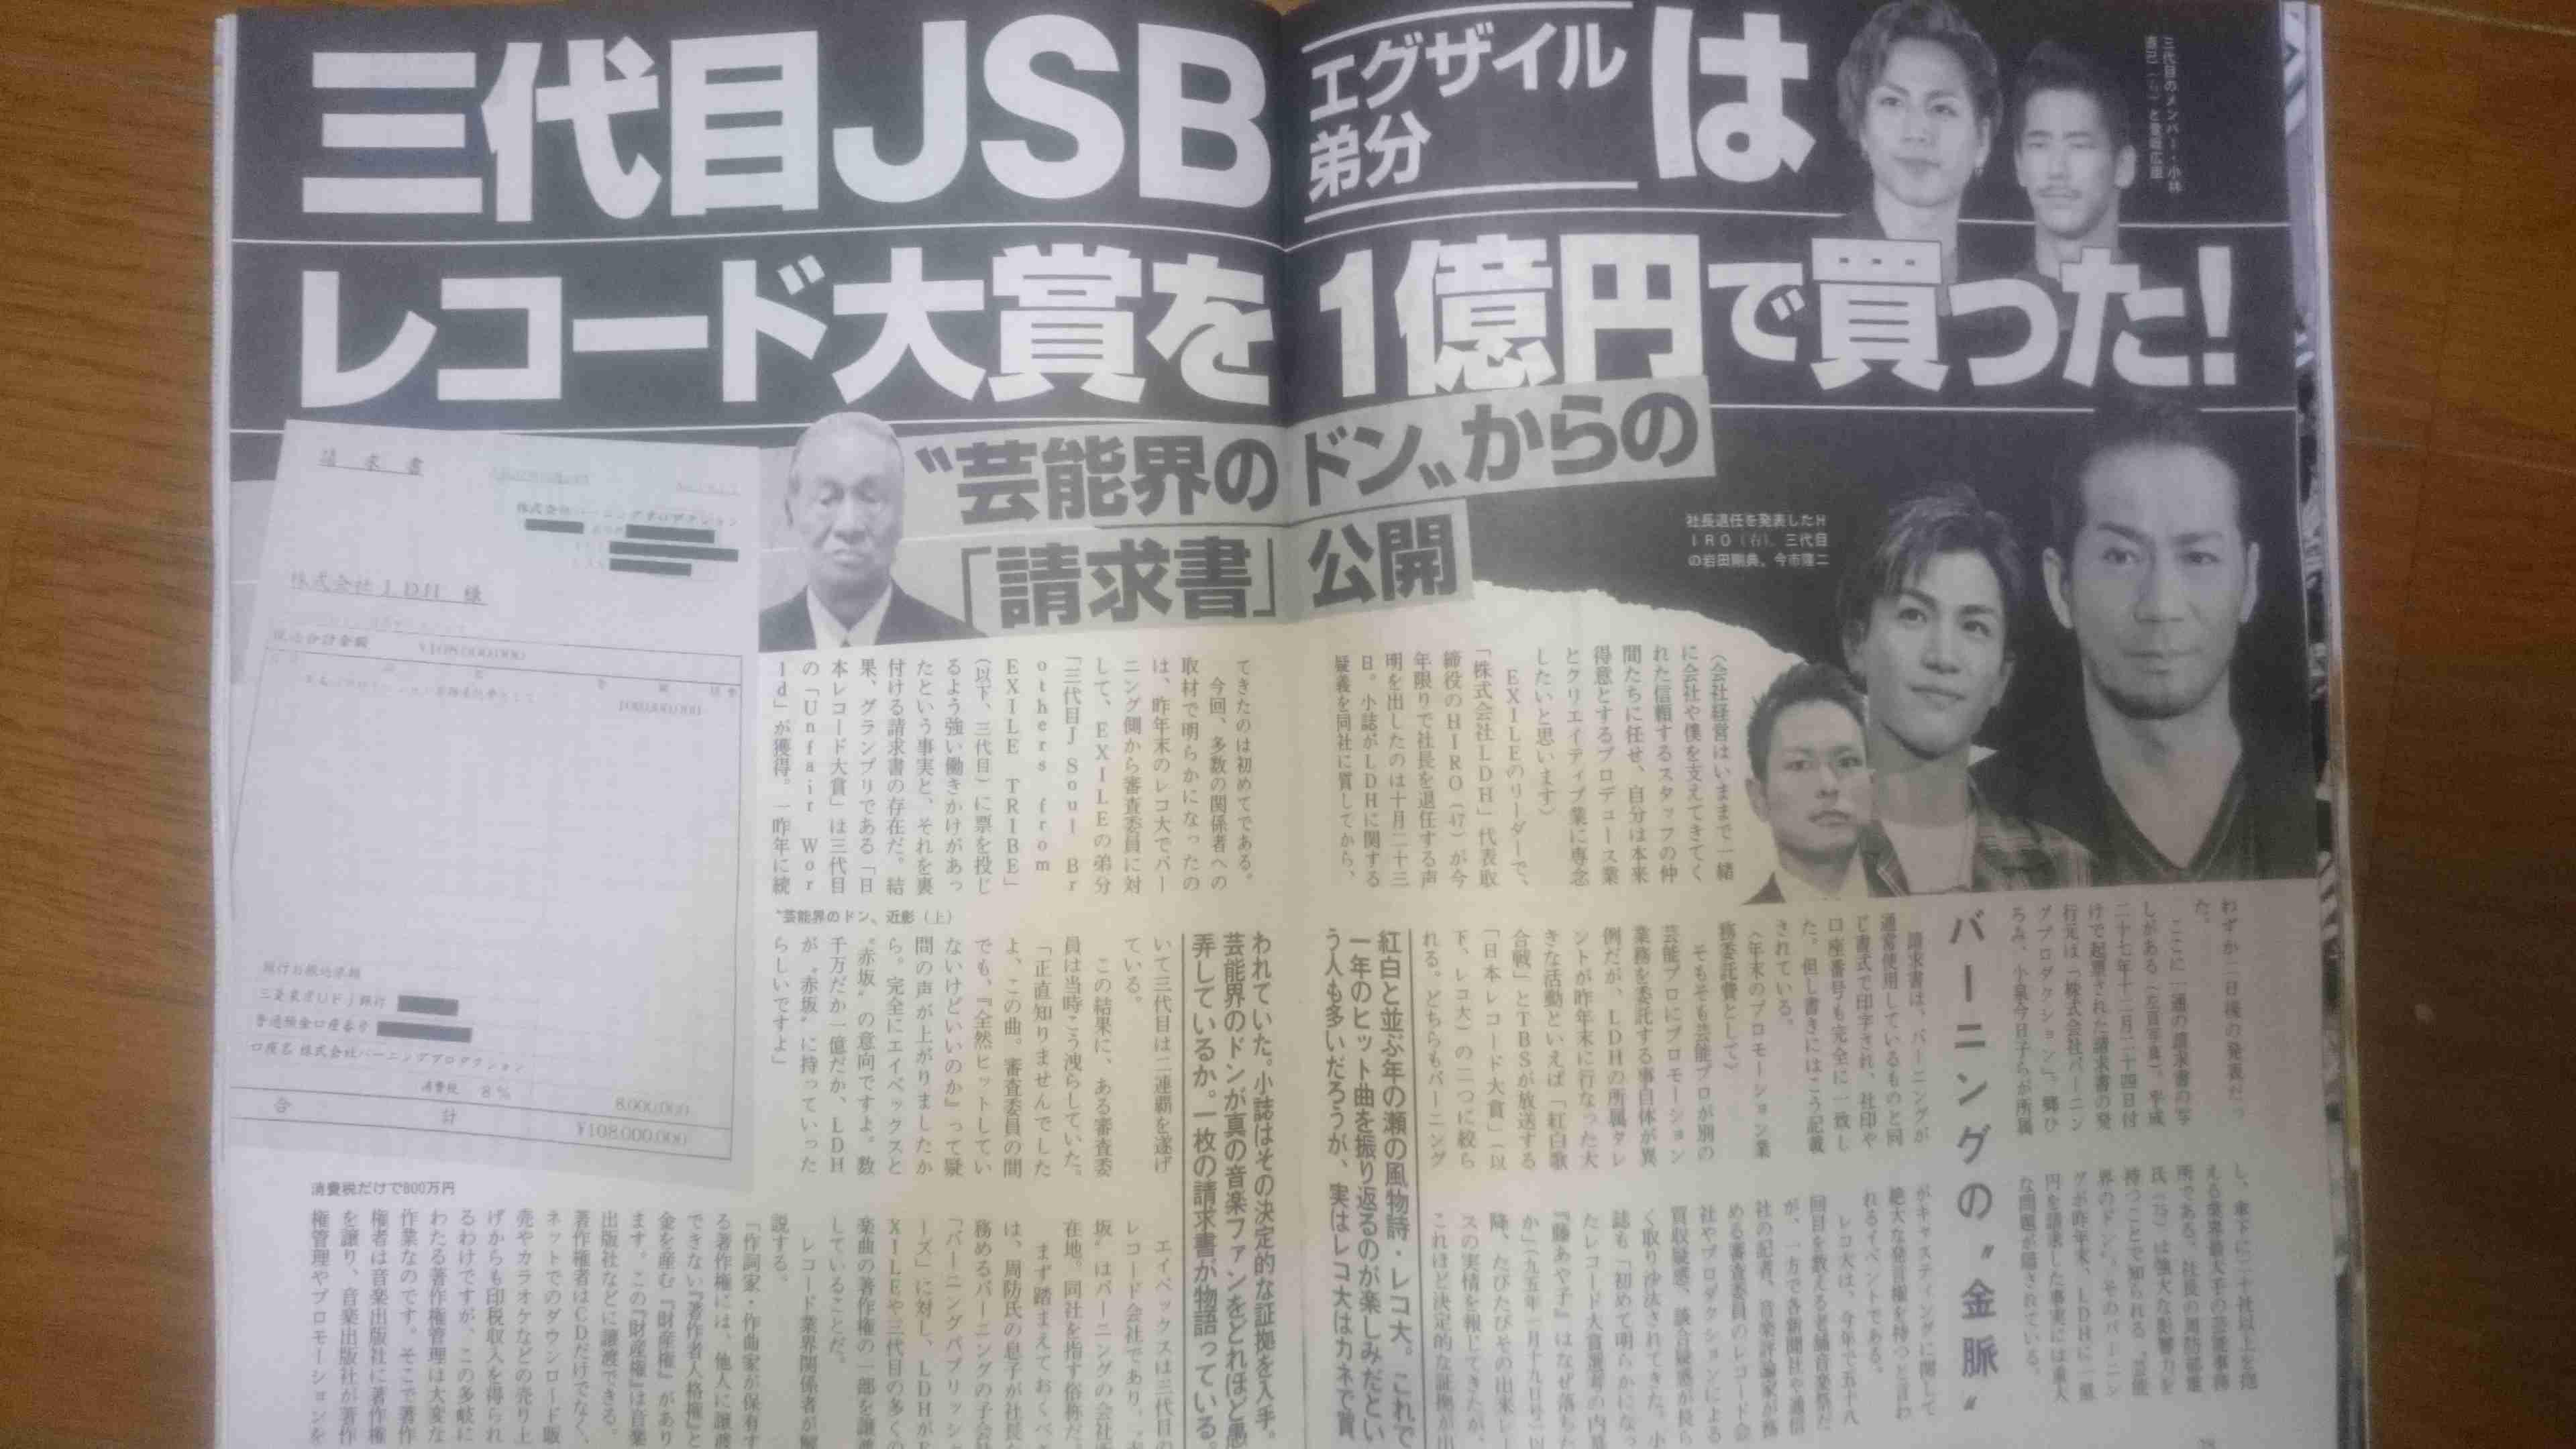 TBS、今年を最後に「日本有線大賞」の放送終了 視聴率低下で…。